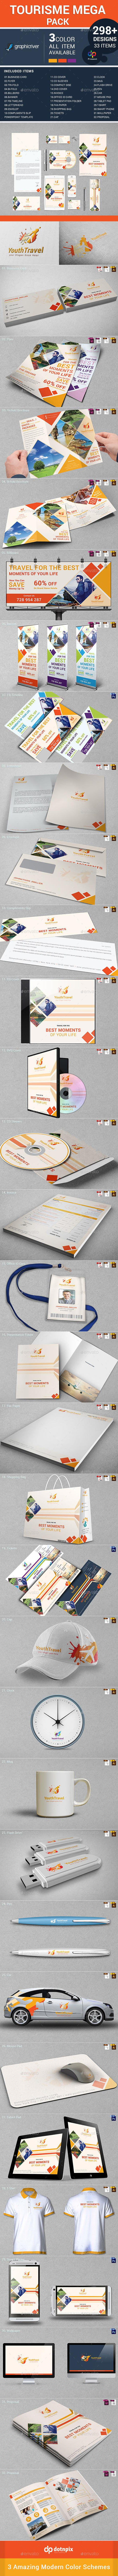 Tourism Mega Pack - Stationery Print Templates